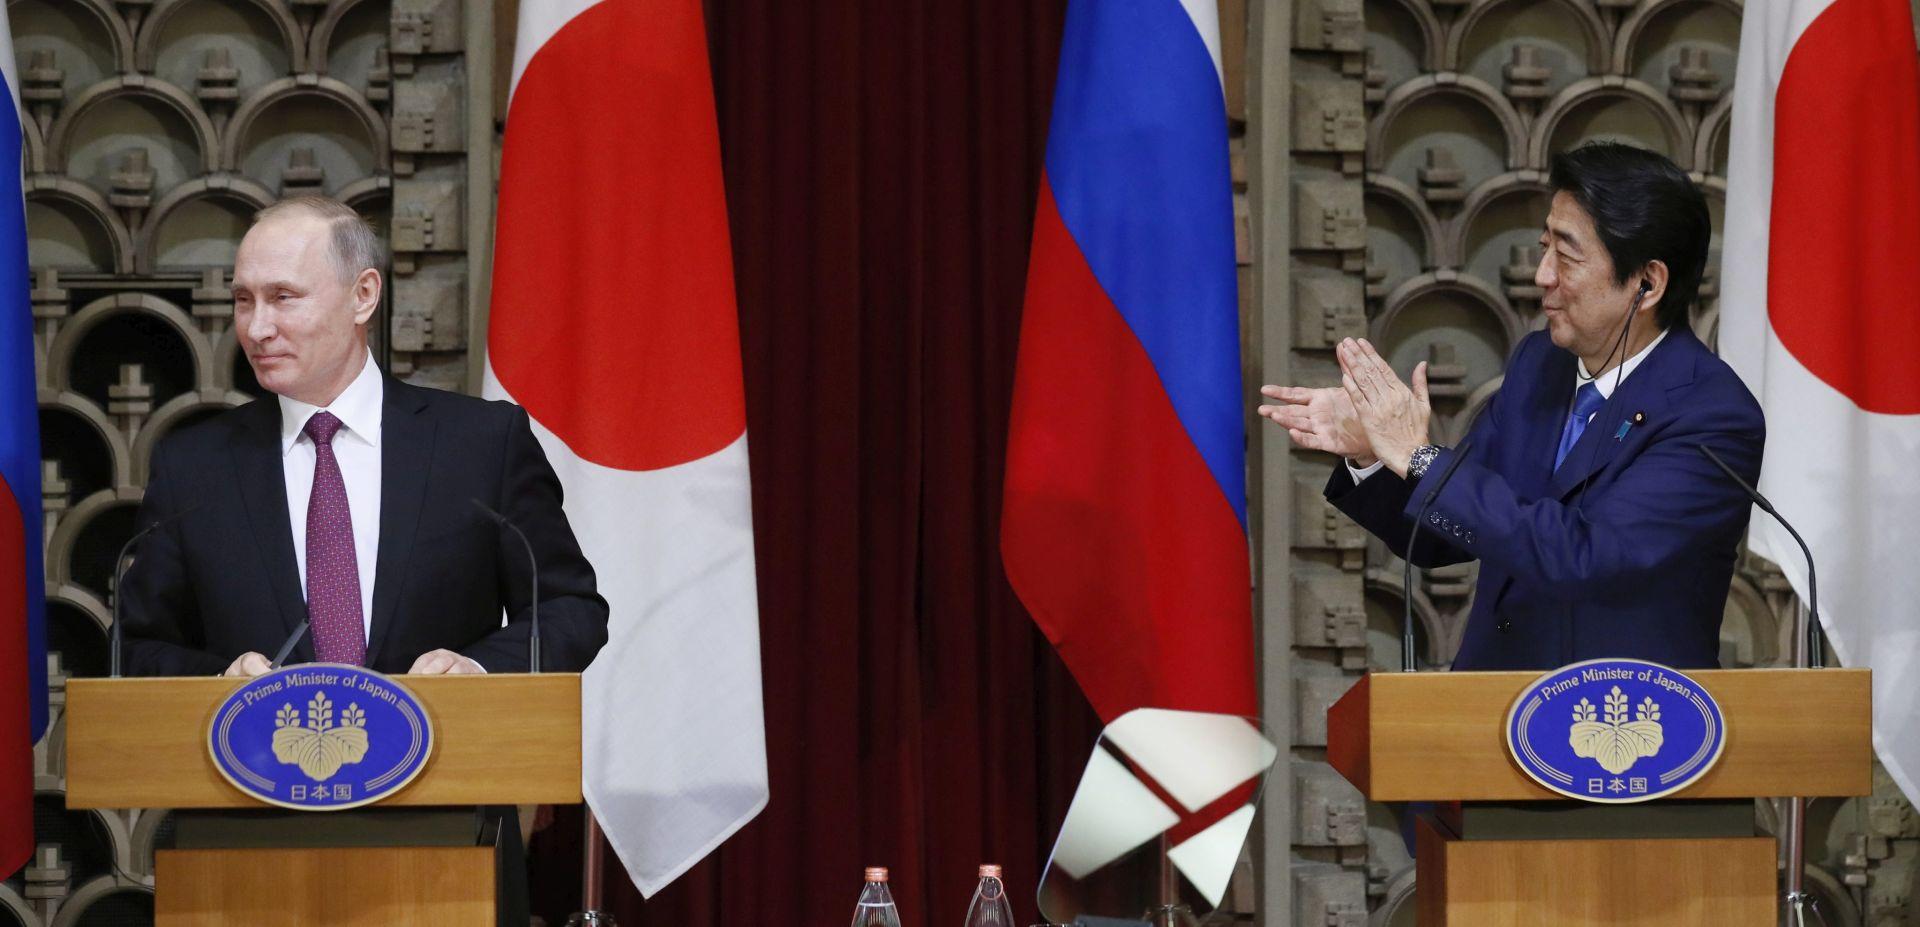 Abe i Putin zaključili dvodnevne razgovore bez dogovora o spornim otocima